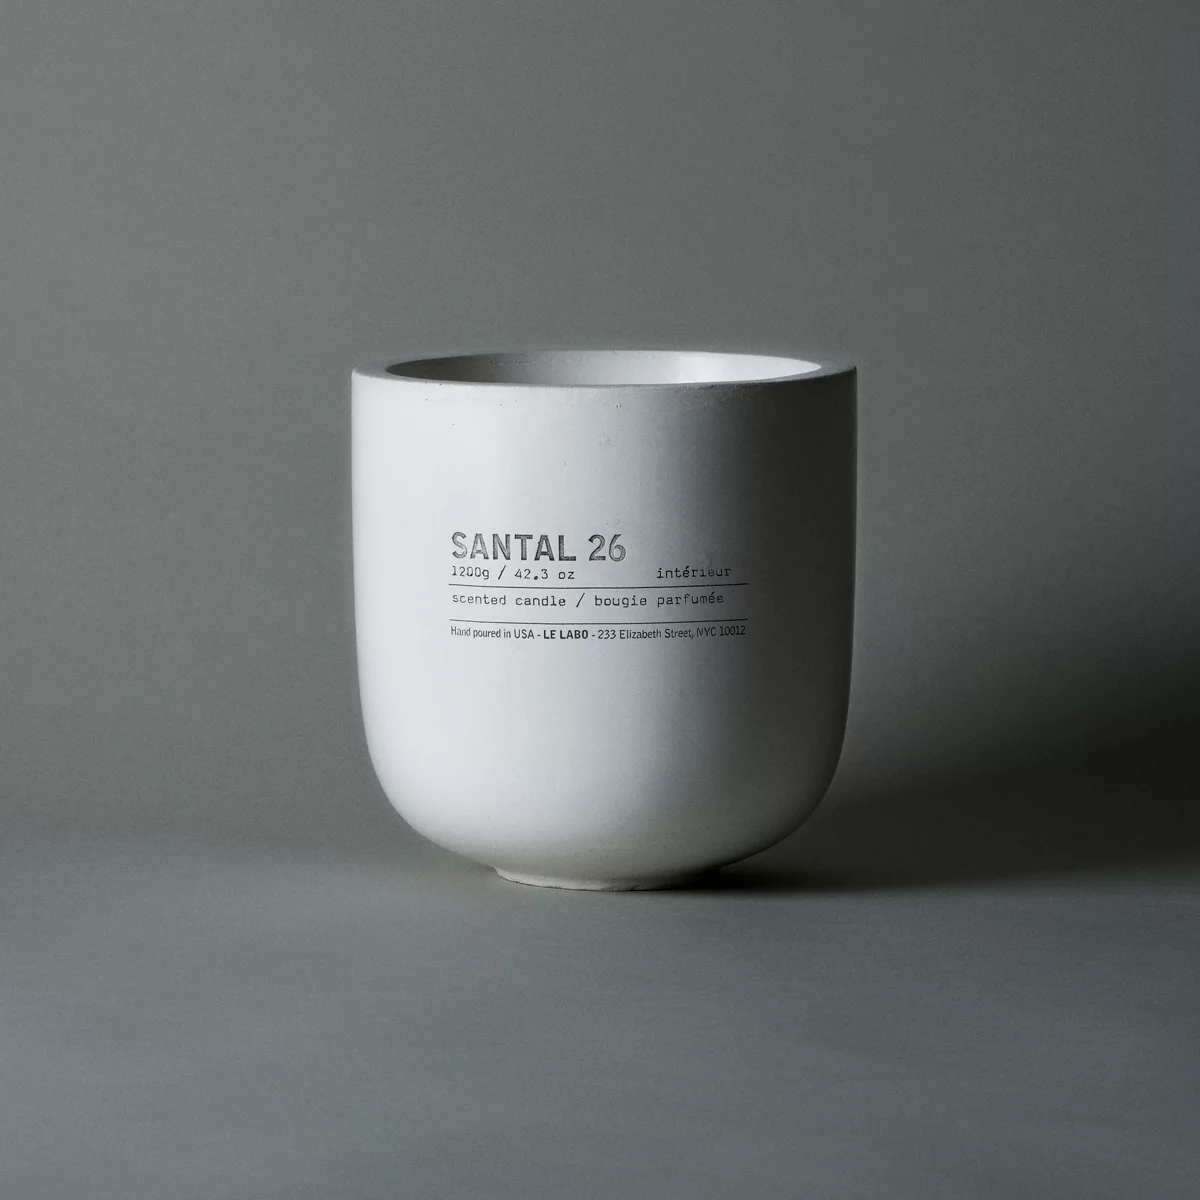 Santal 26 White Concrete Candle